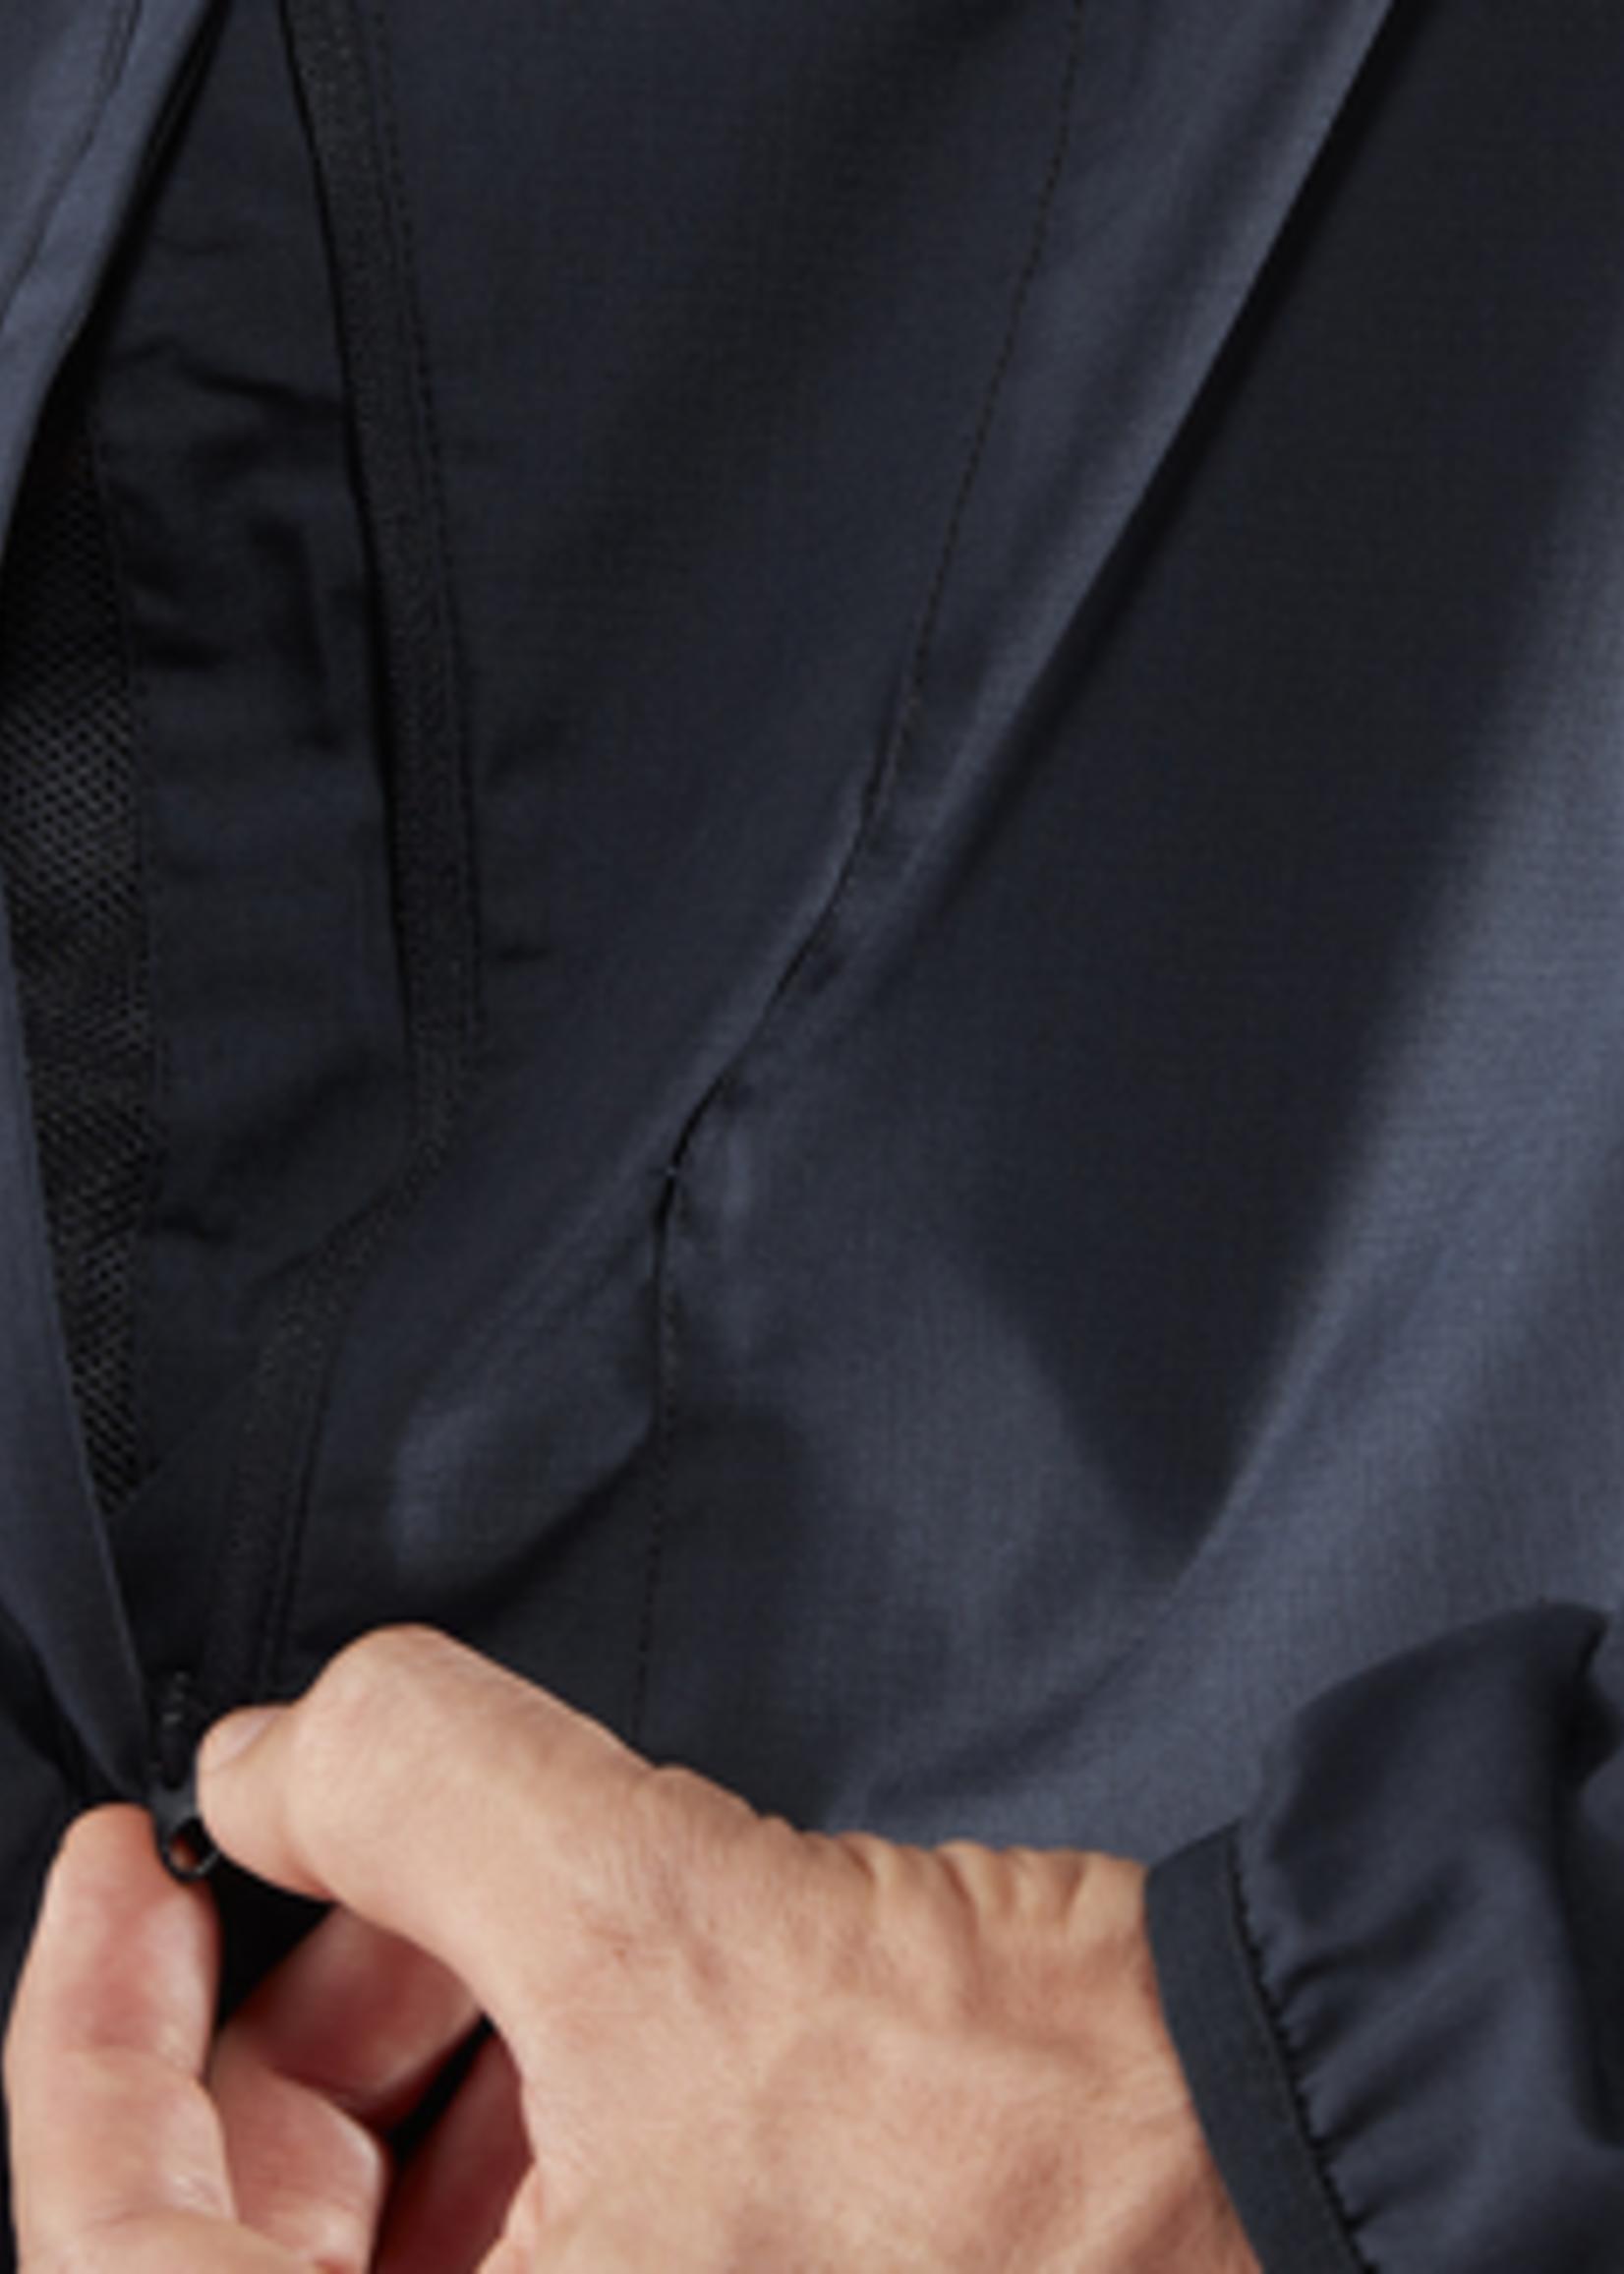 FJALL RAVEN HIGH COAST SHADE Jacket, Organic|Recycled